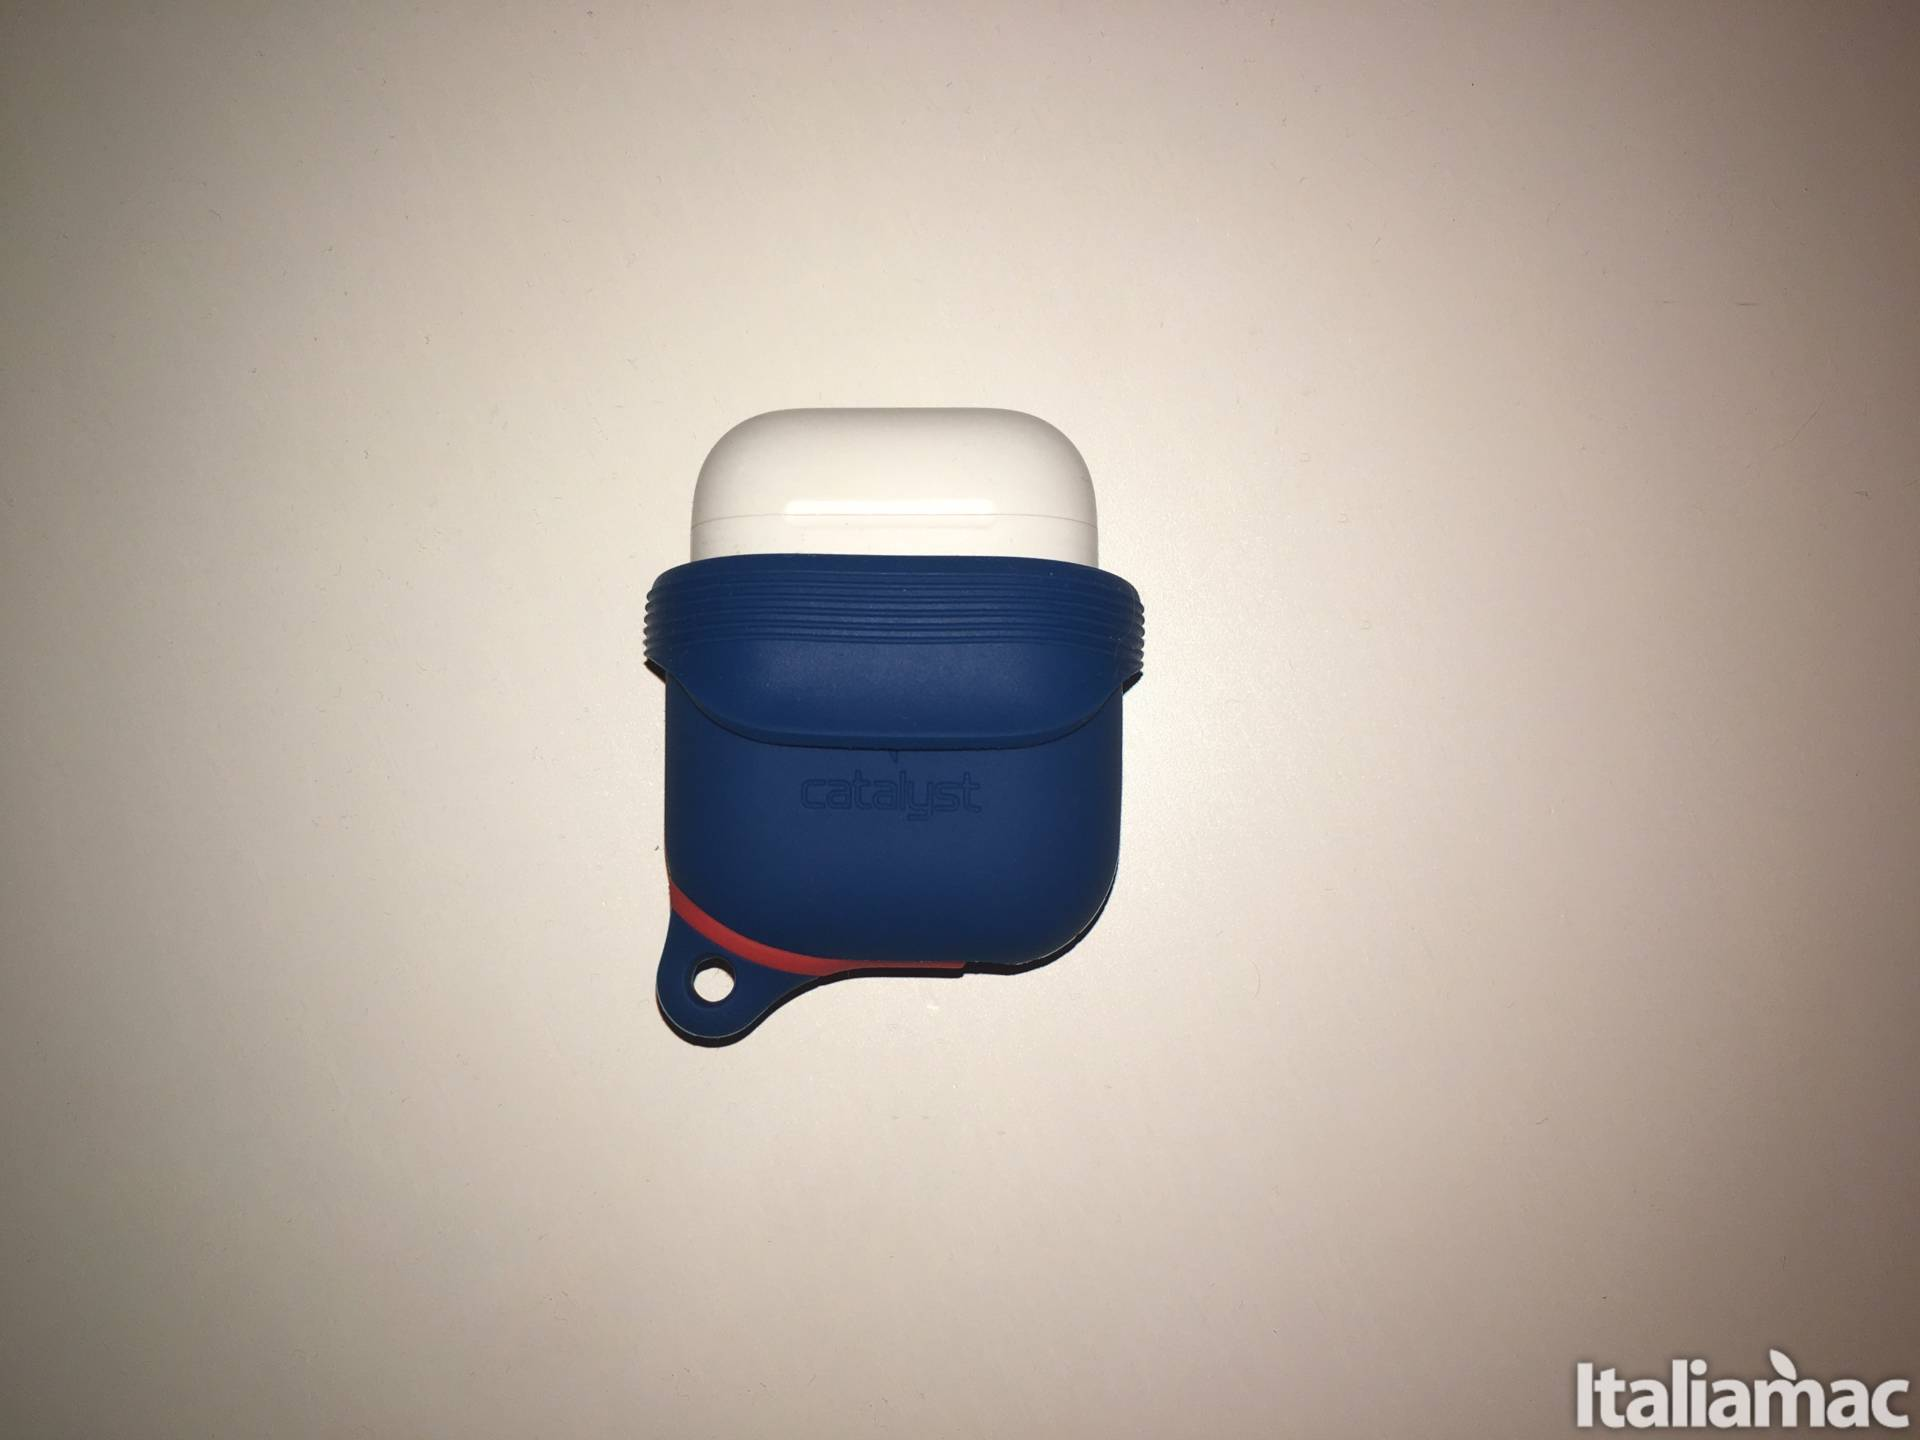 www.italiamac.it proteggi airpods cadute schizzi catalyst catalyst airpods case open Proteggi le AirPods da cadute e schizzi dacqua con il case di Catalyst